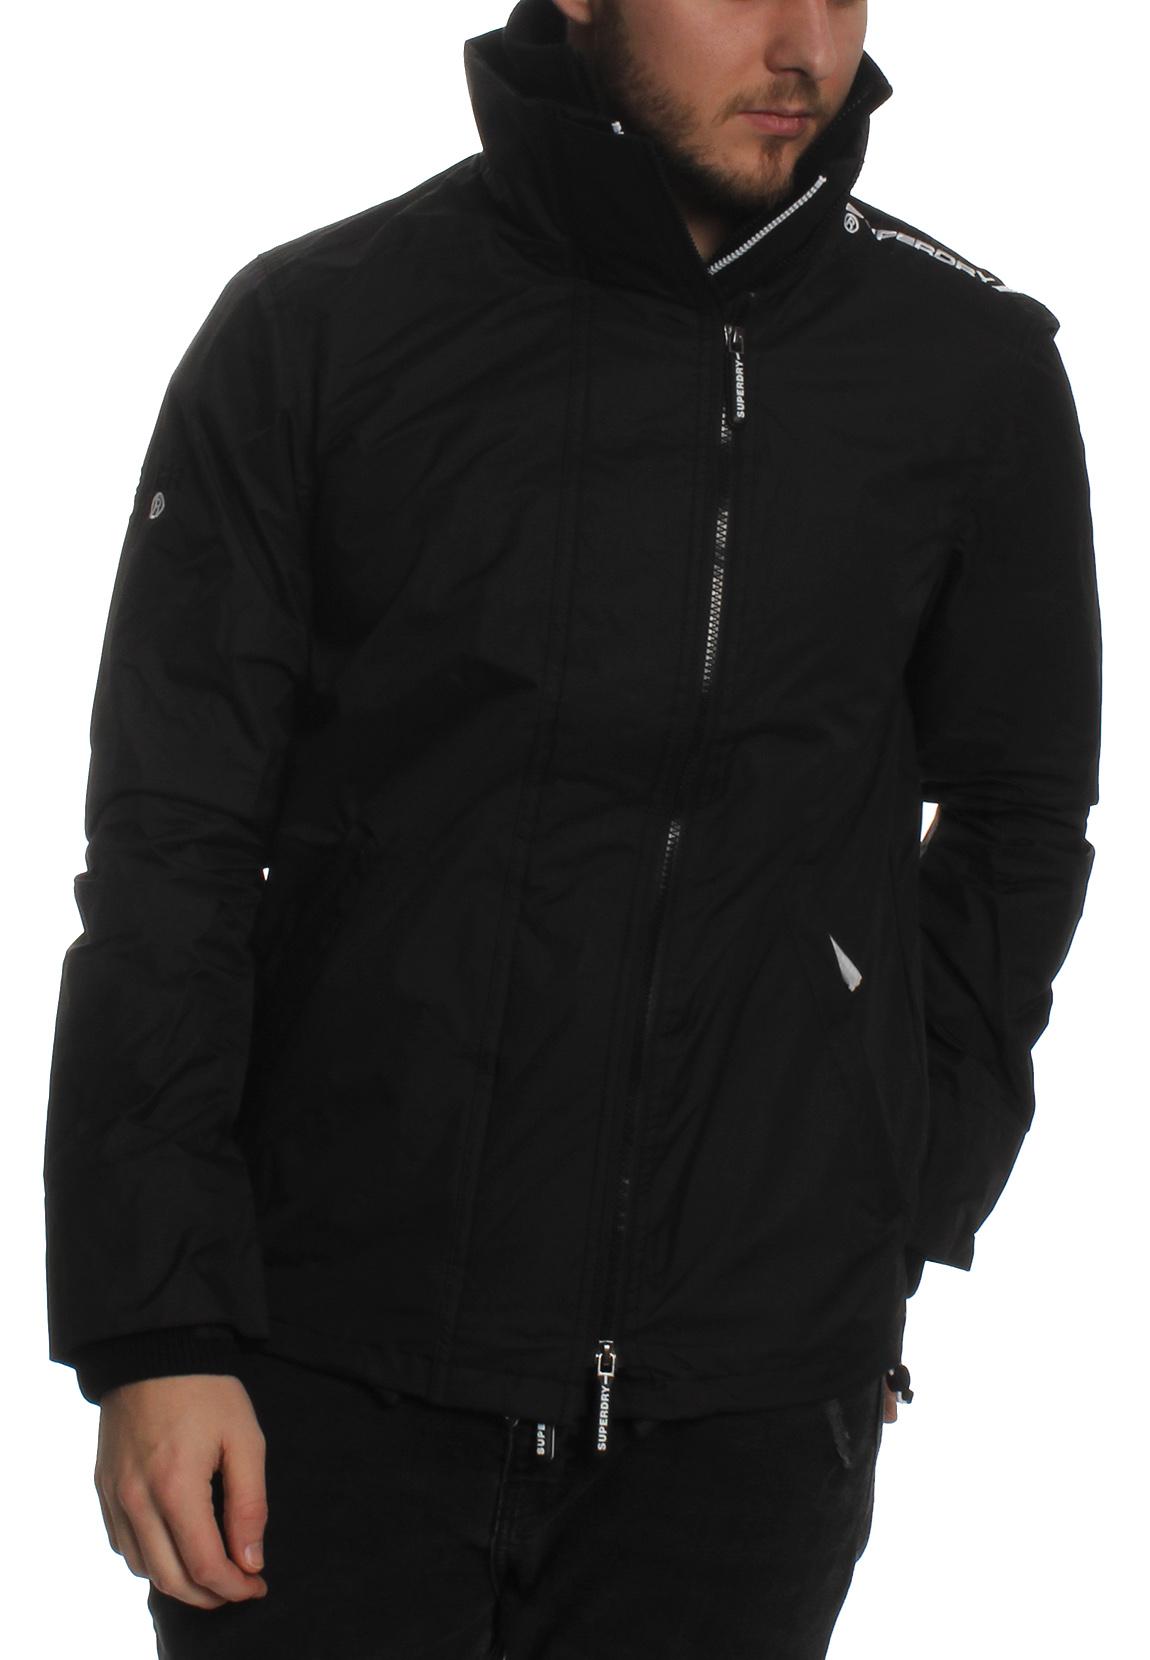 new styles 4c547 5abc3 Superdy Jacke Herren TECHNICAL POP ZIP WINDCHEATER Black Optic White